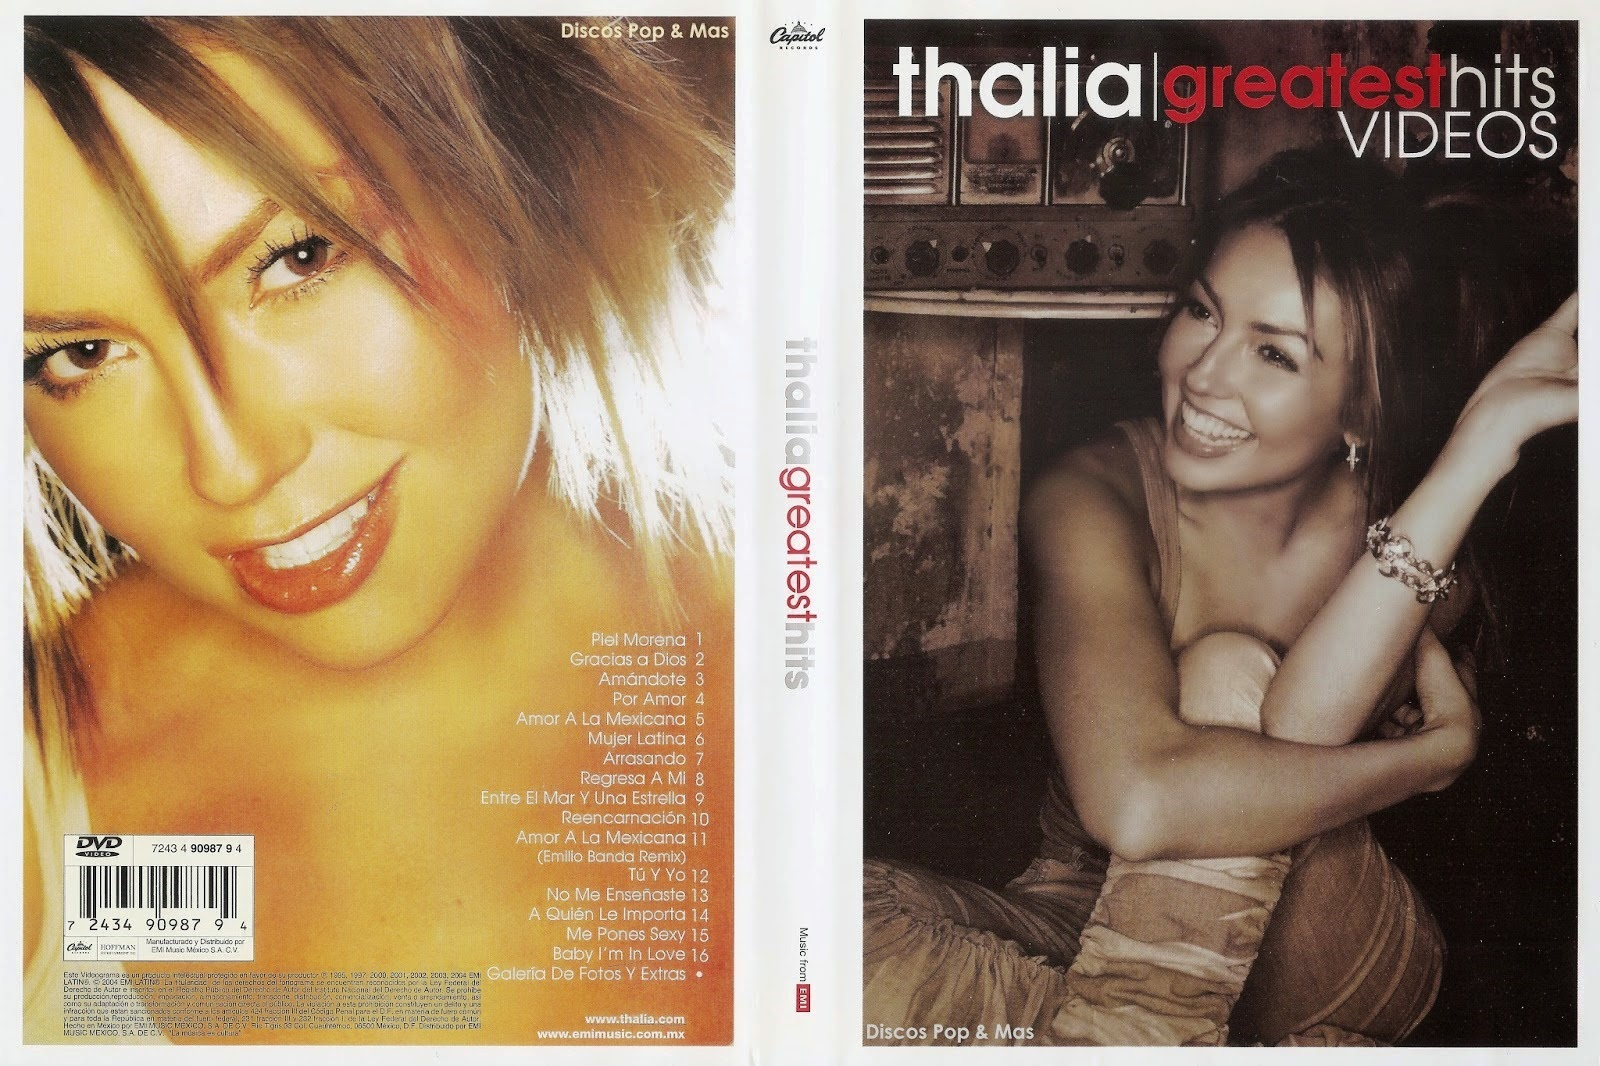 dvd thalia greatest hits